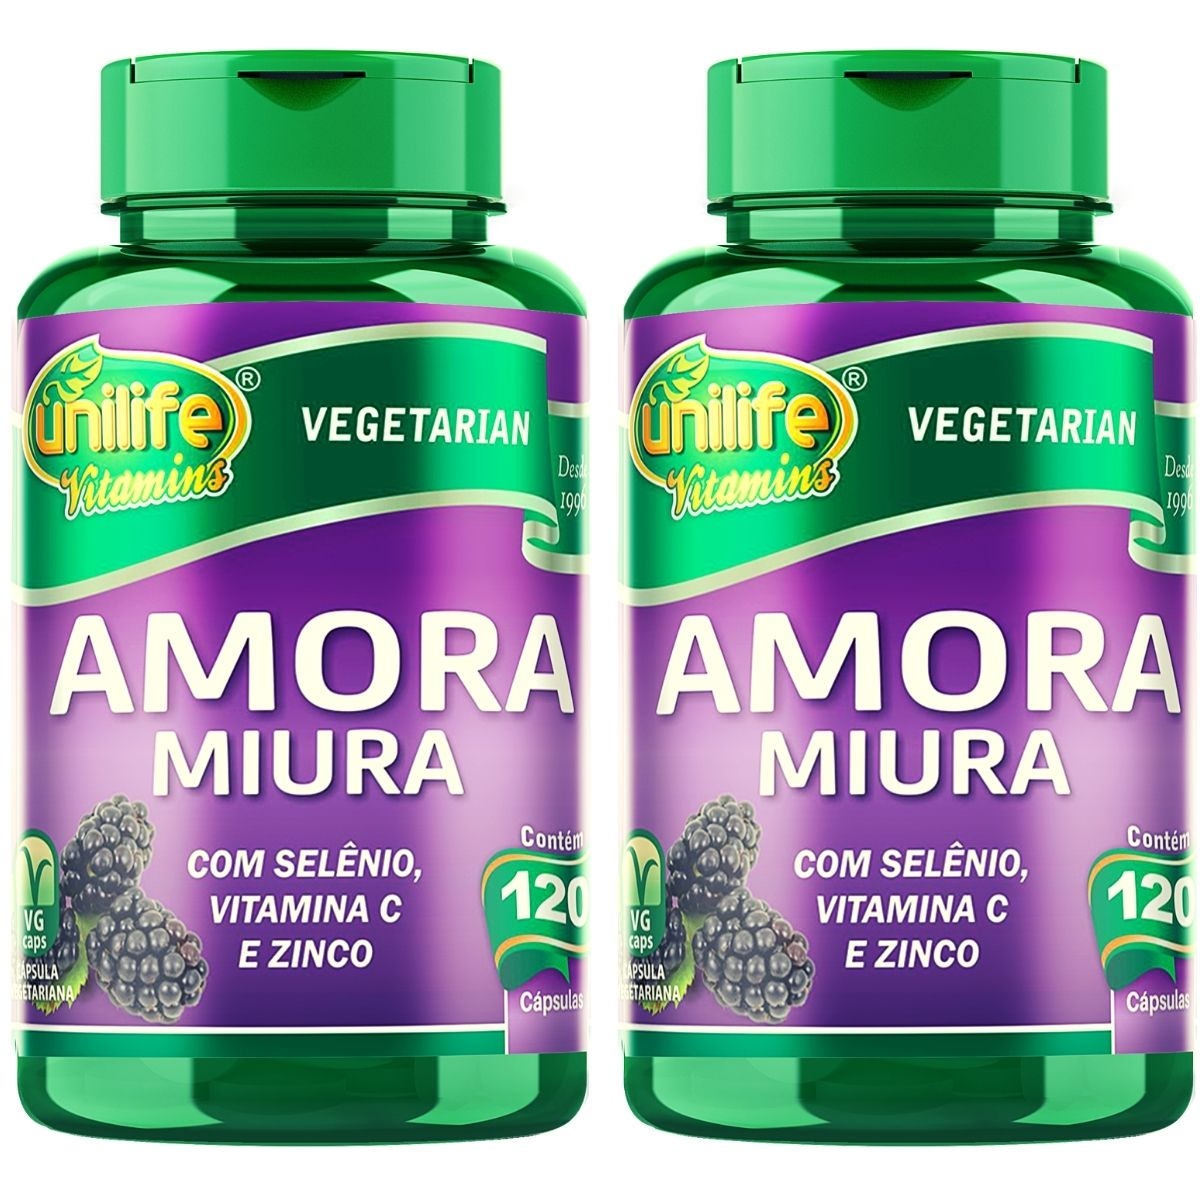 2x Amora Miura 120 Cápsulas Cada - Unilife Vitamins